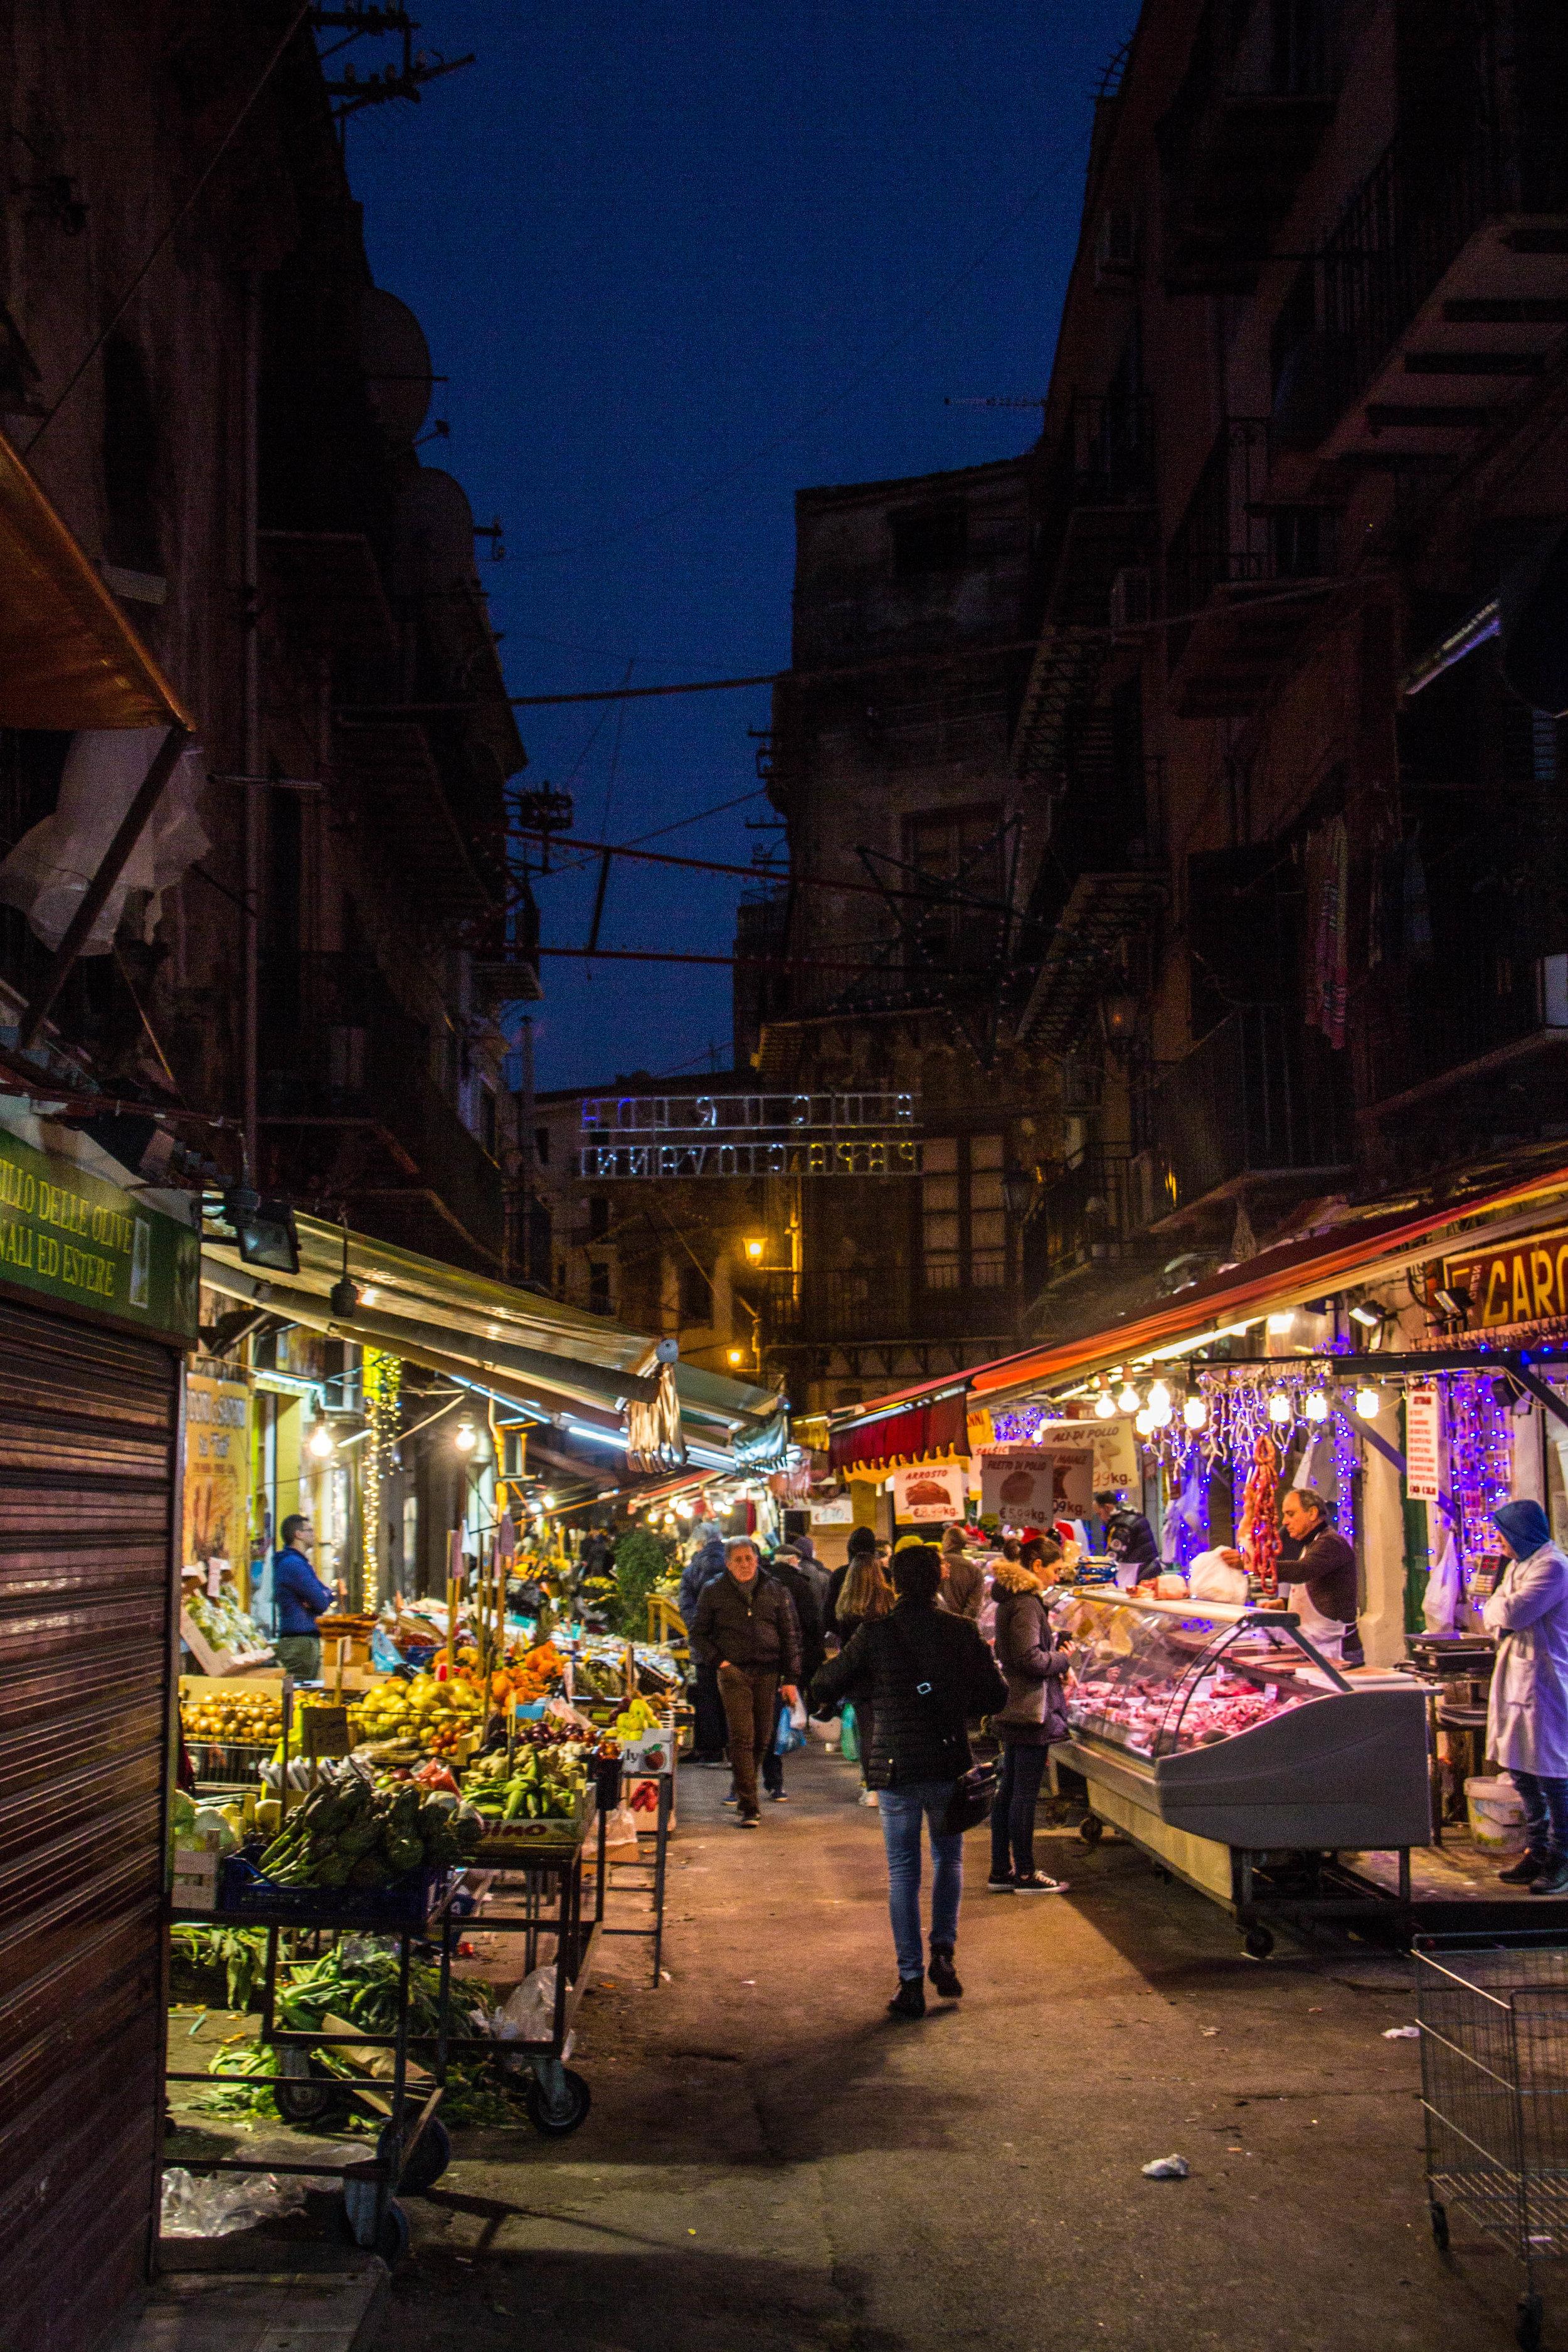 night-street-market-palermo-sicily-7.jpg